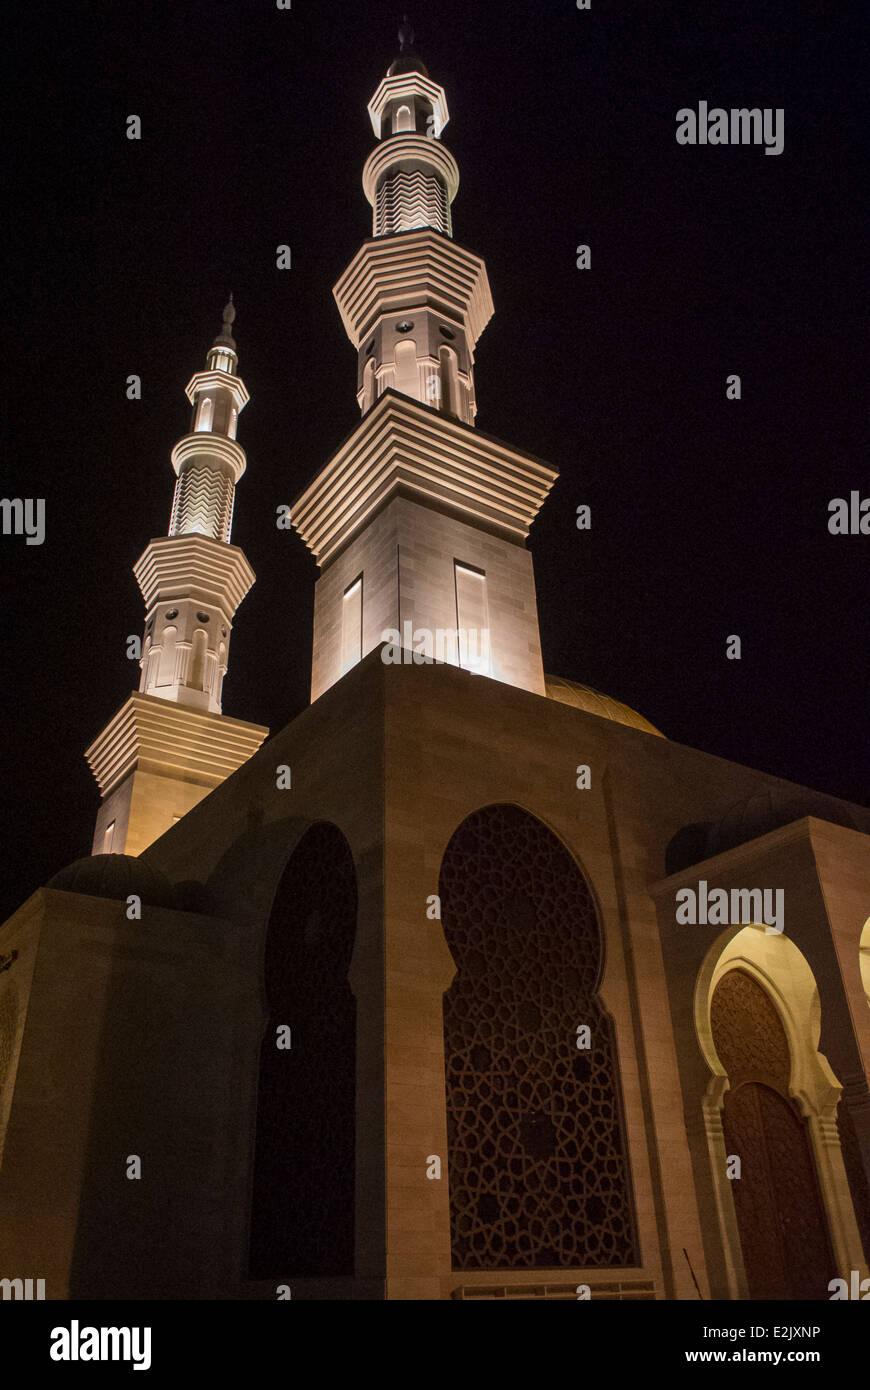 Al Khaldi Mosque Gaza City,Palestine. - Stock Image